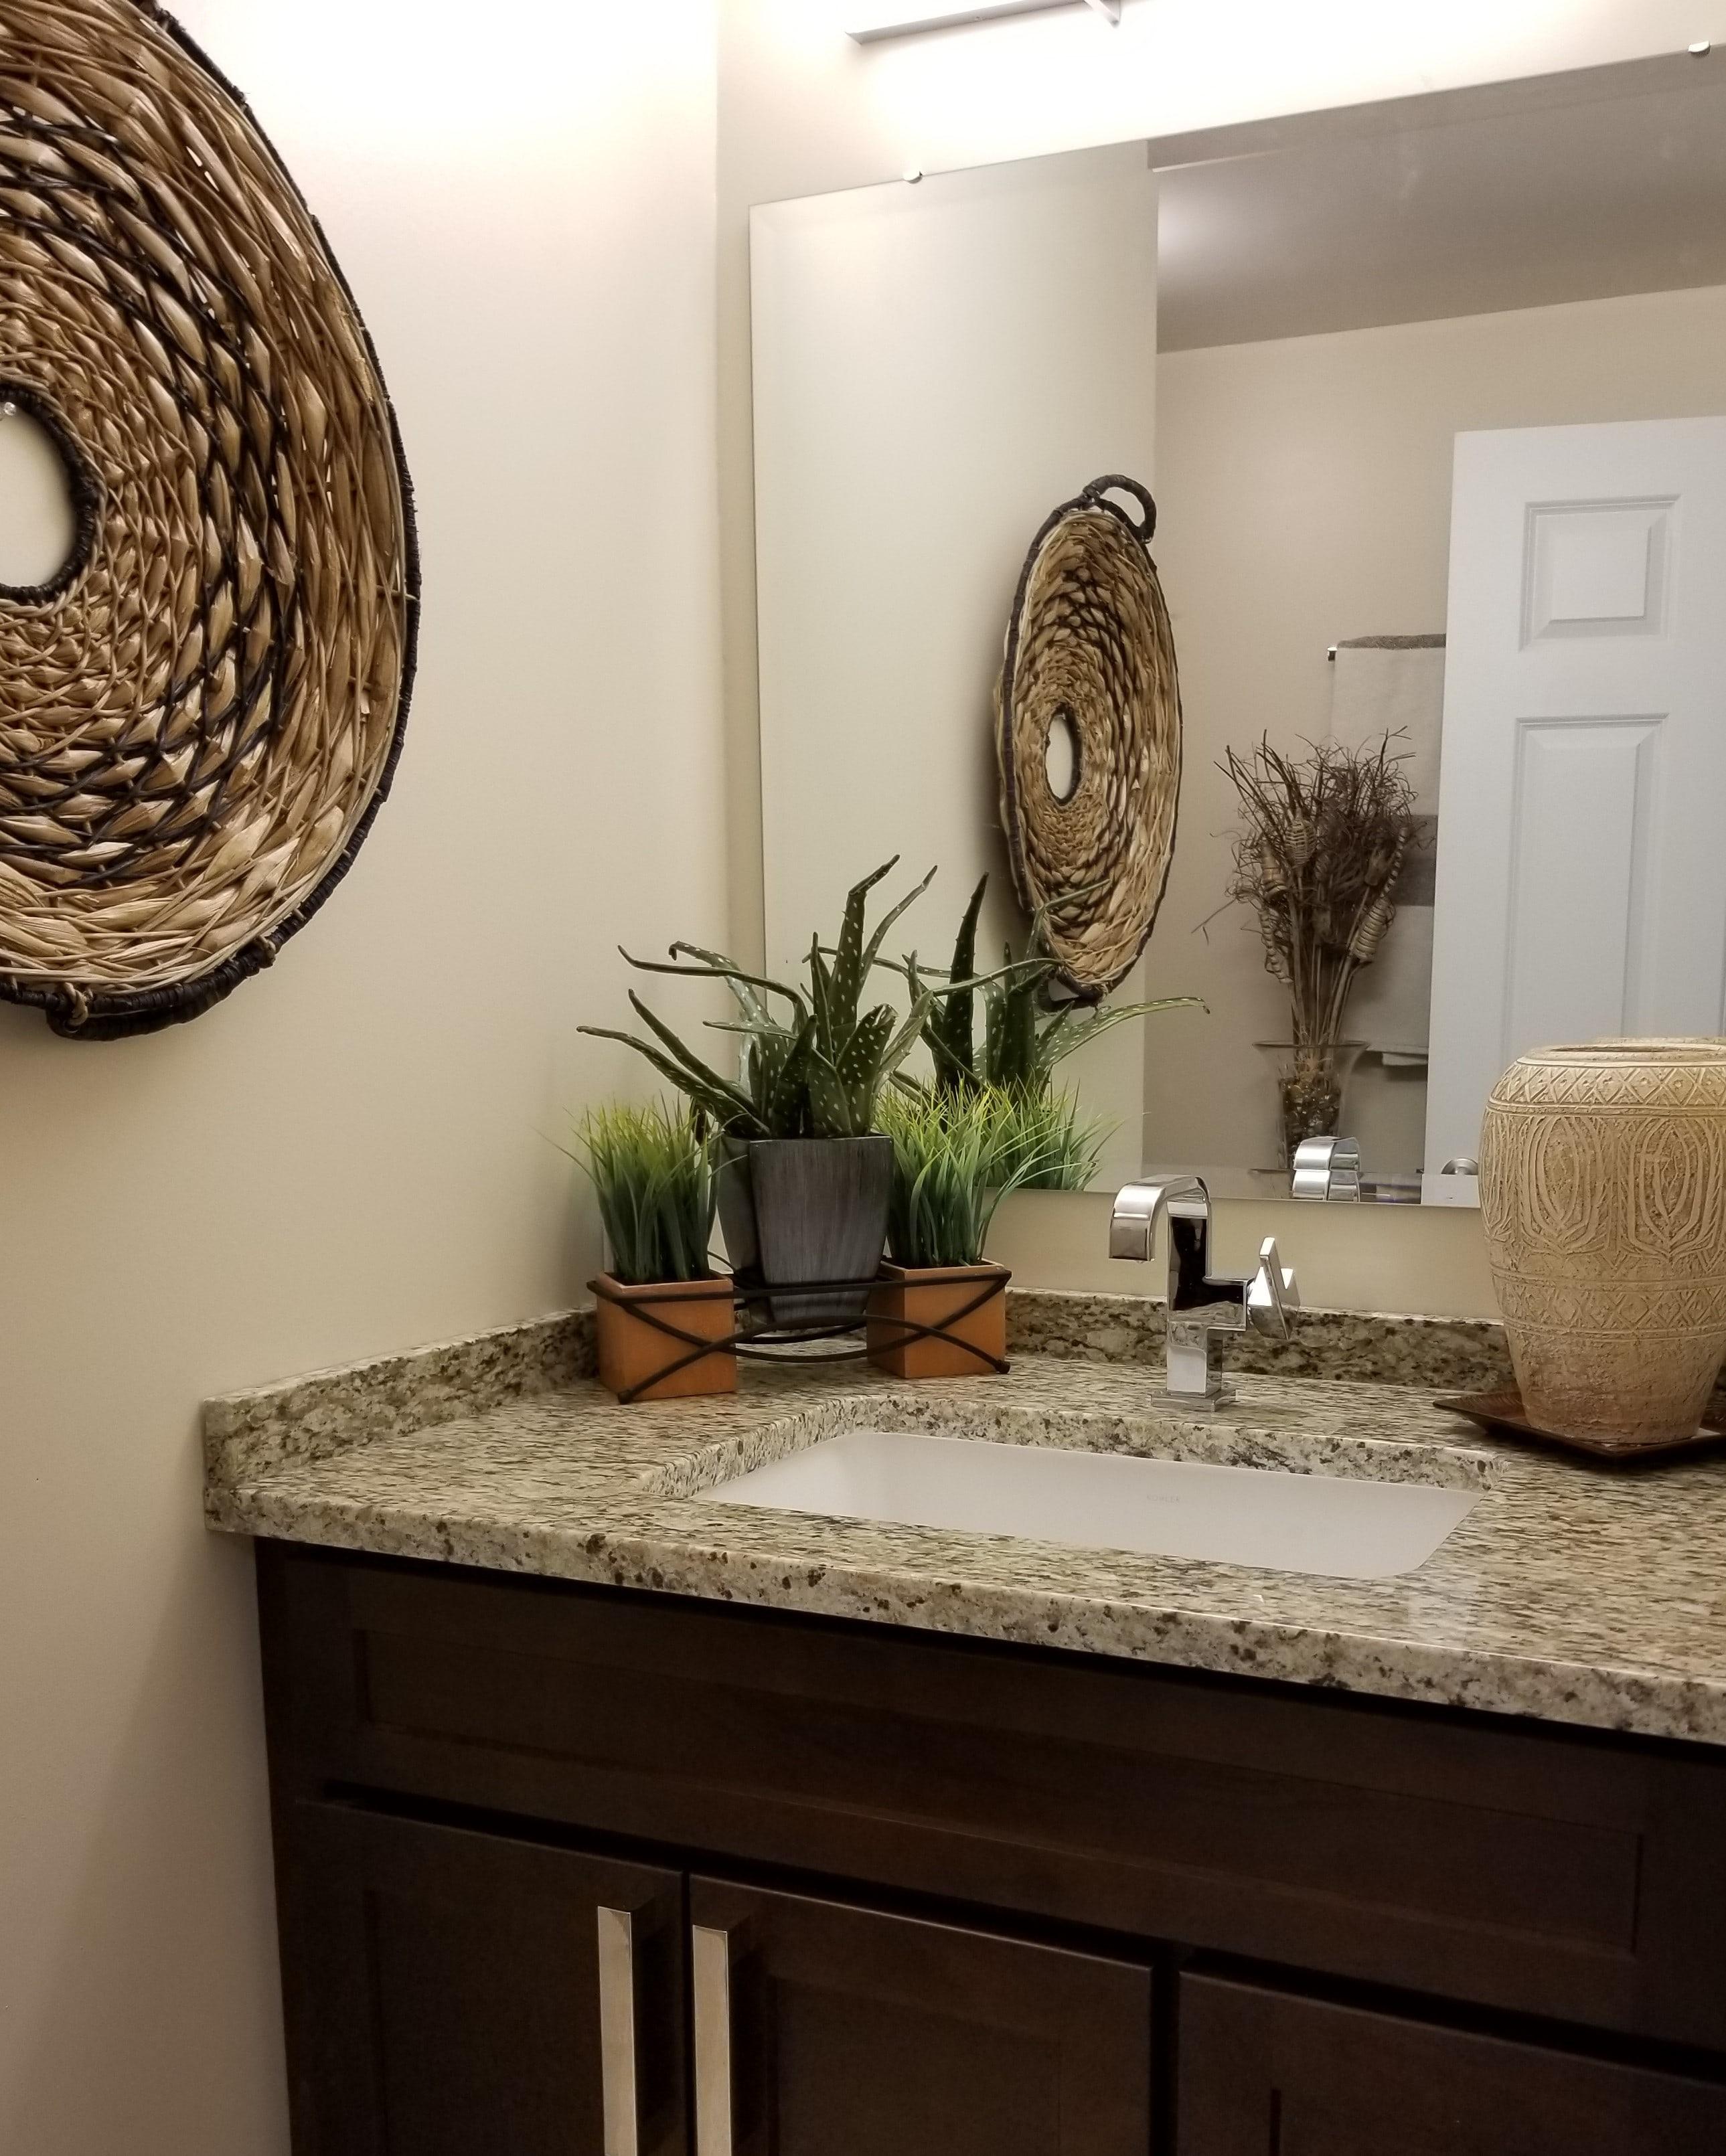 https://0201.nccdn.net/1_2/000/000/154/43c/Stage-Bathroom-min.jpg